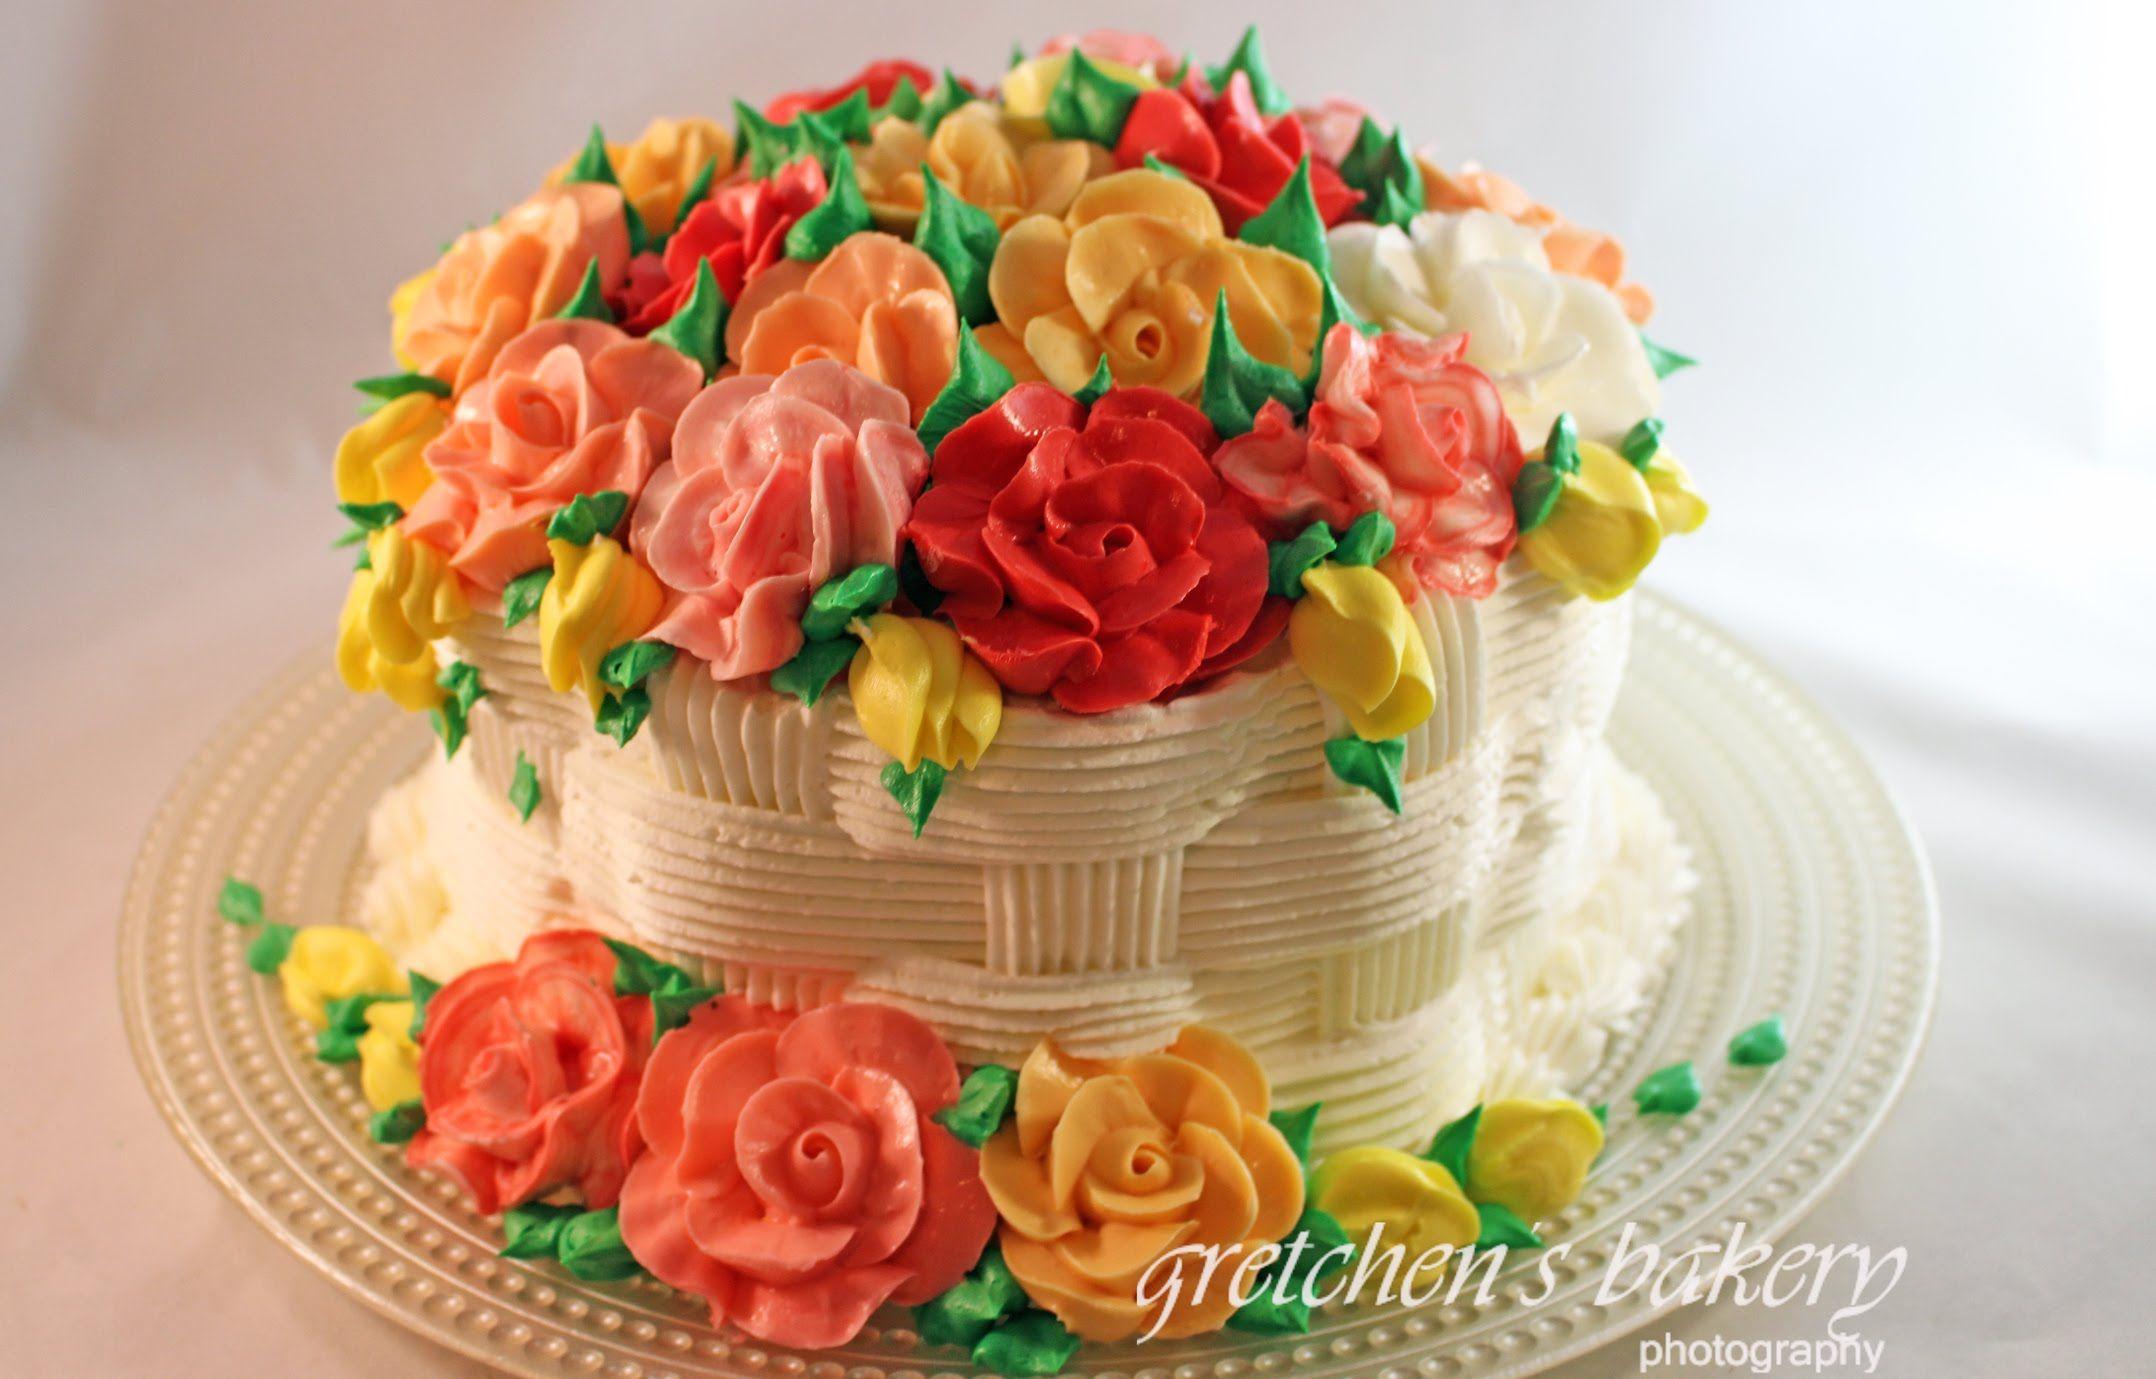 Basketweave flower cake for beginners cake decorating